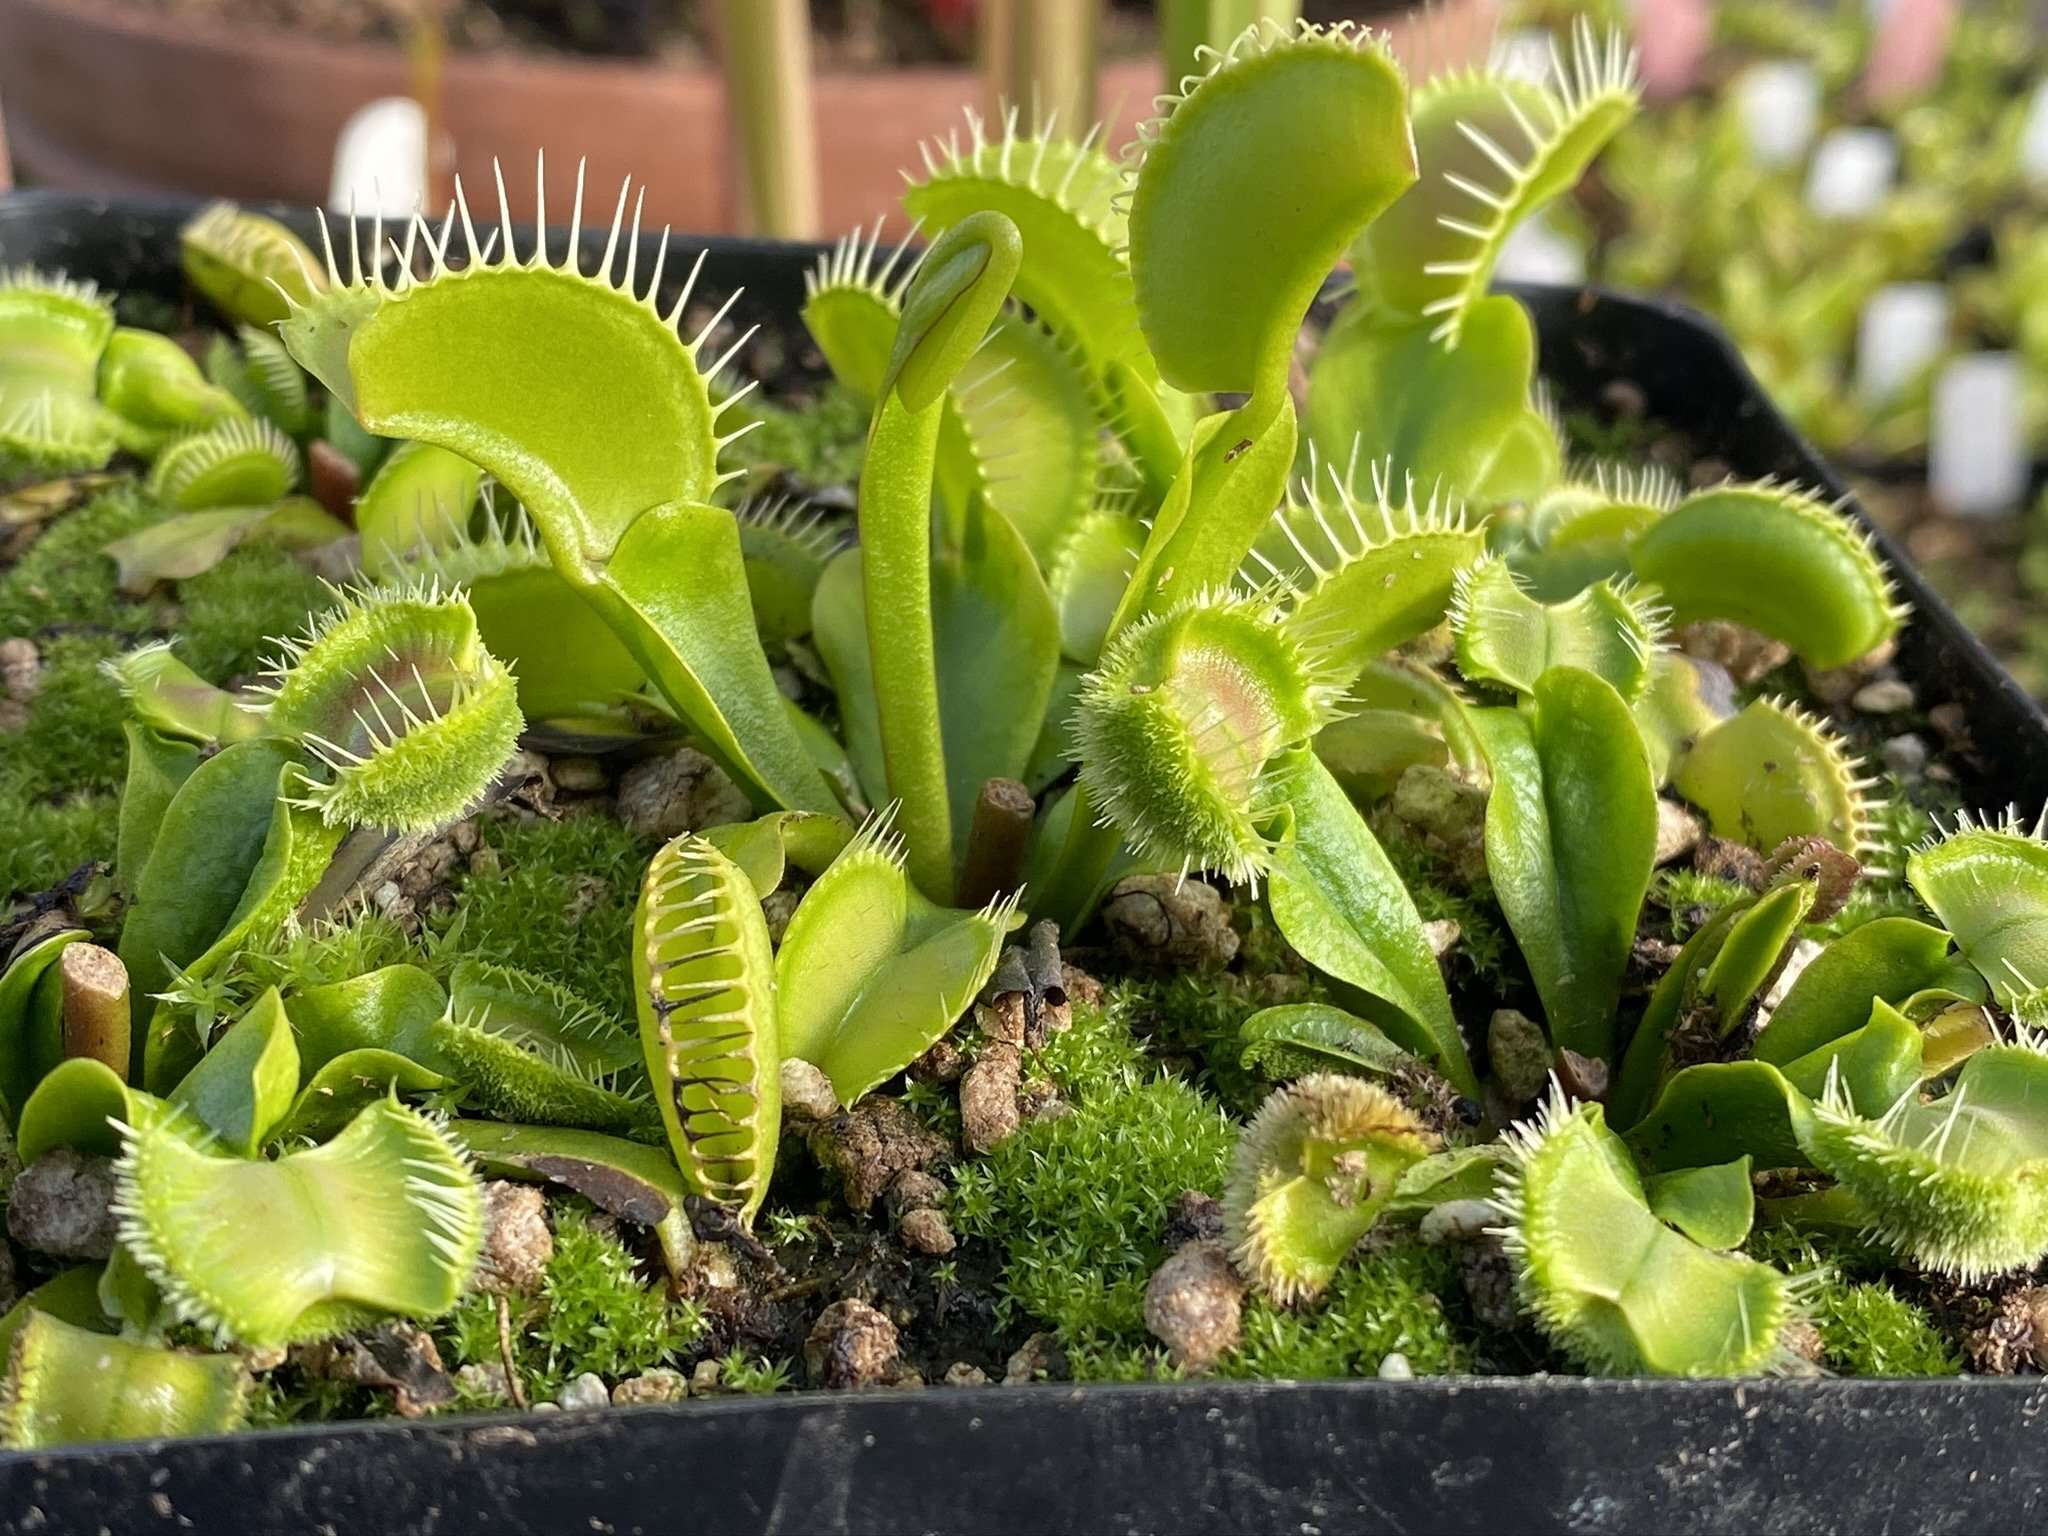 Dionaea st patrick's beard